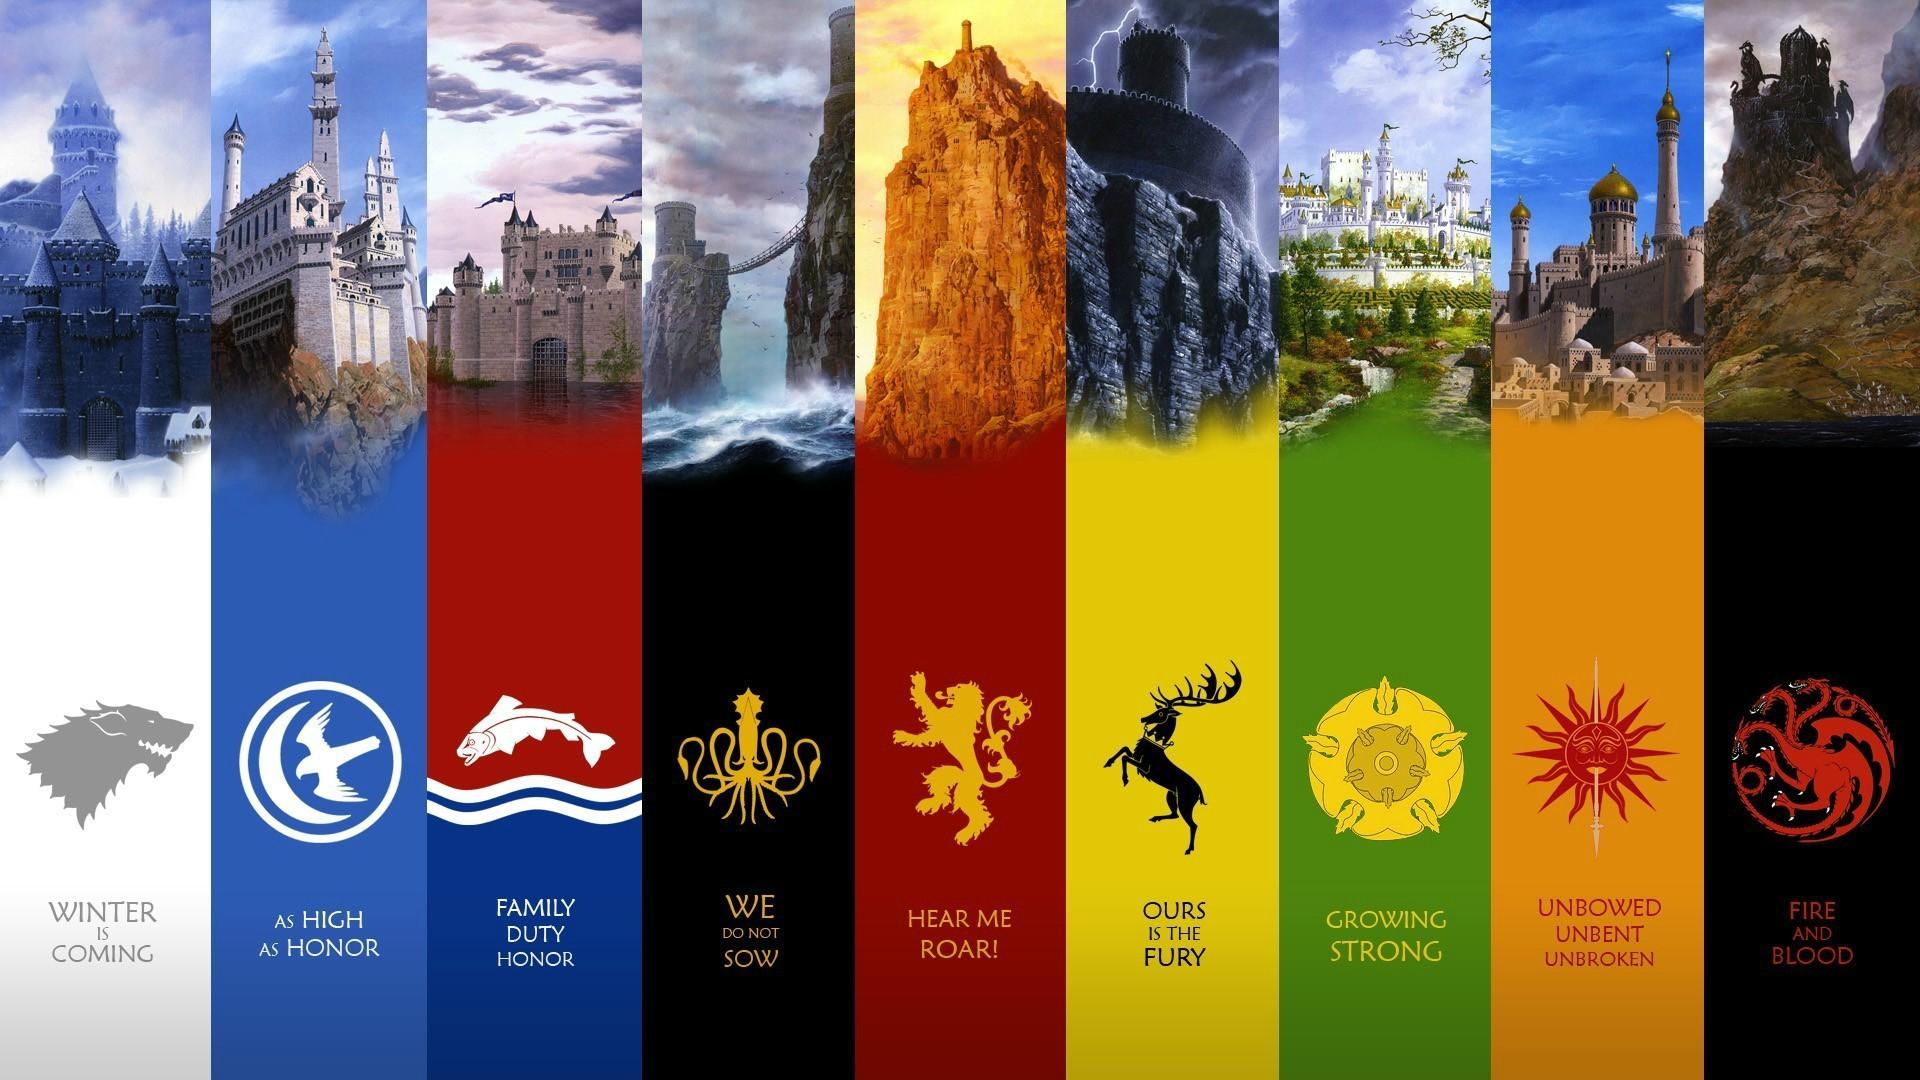 Game Of Thrones Hd Wallpaper News Ucluz 1920x1080